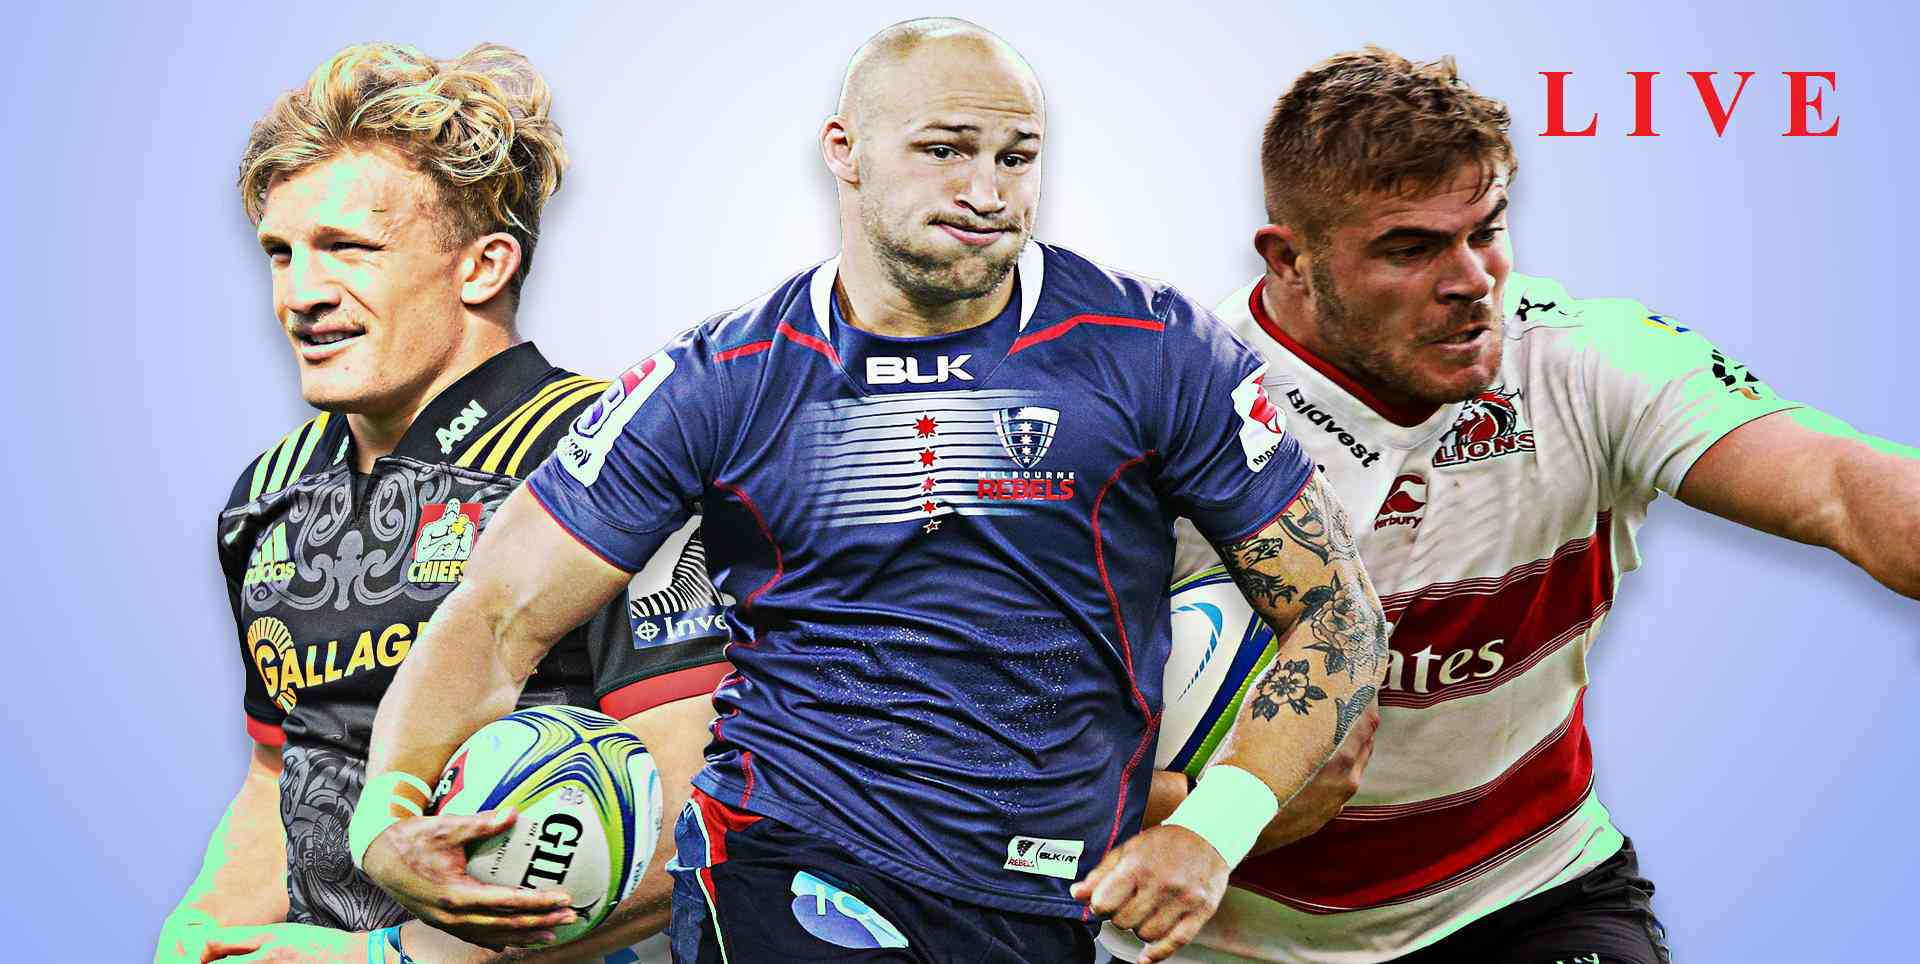 ireland-vs-fiji-rugby-live